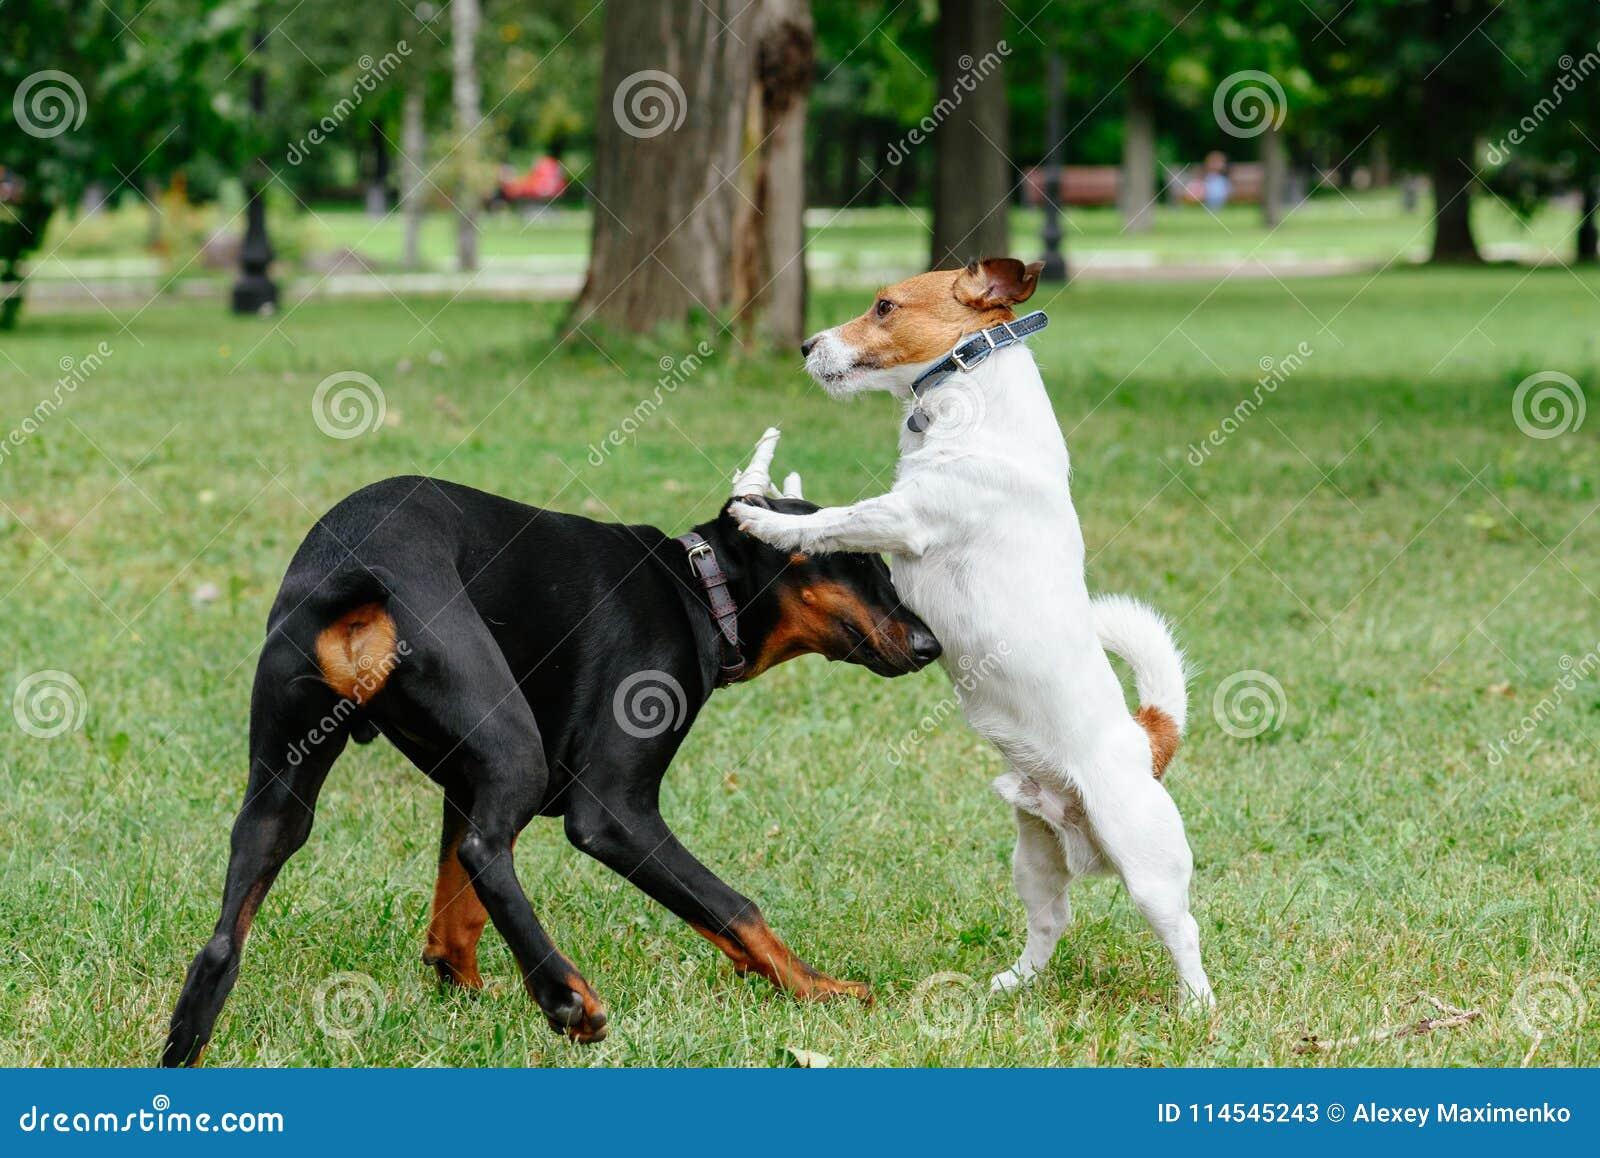 Jack Russell Terrier Dog Playing With Playful Doberman Pinscher